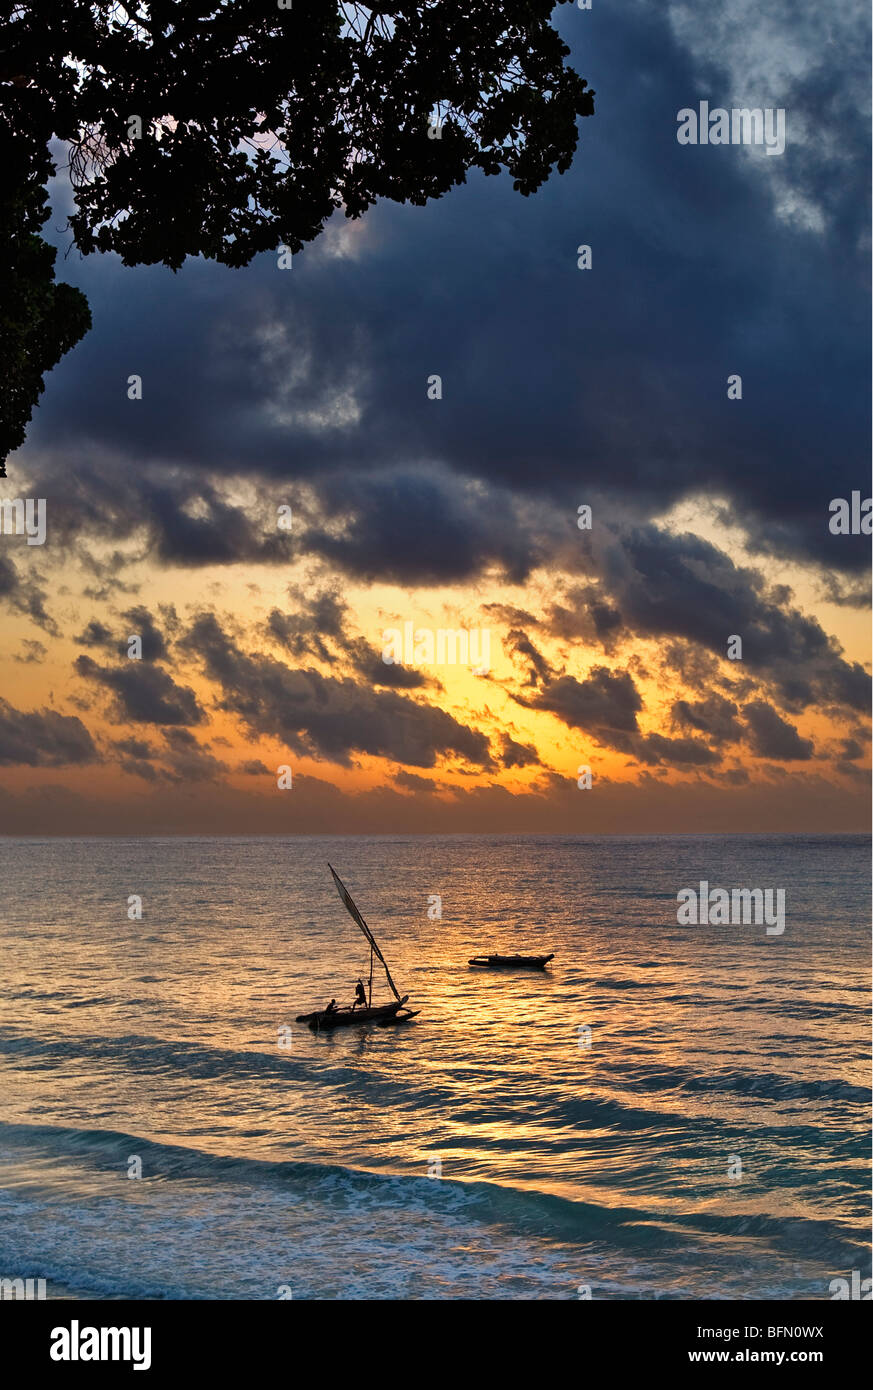 Kenya Mombassa. An outrigger canoe sets sail from Diani Beach at sunrise. - Stock Image